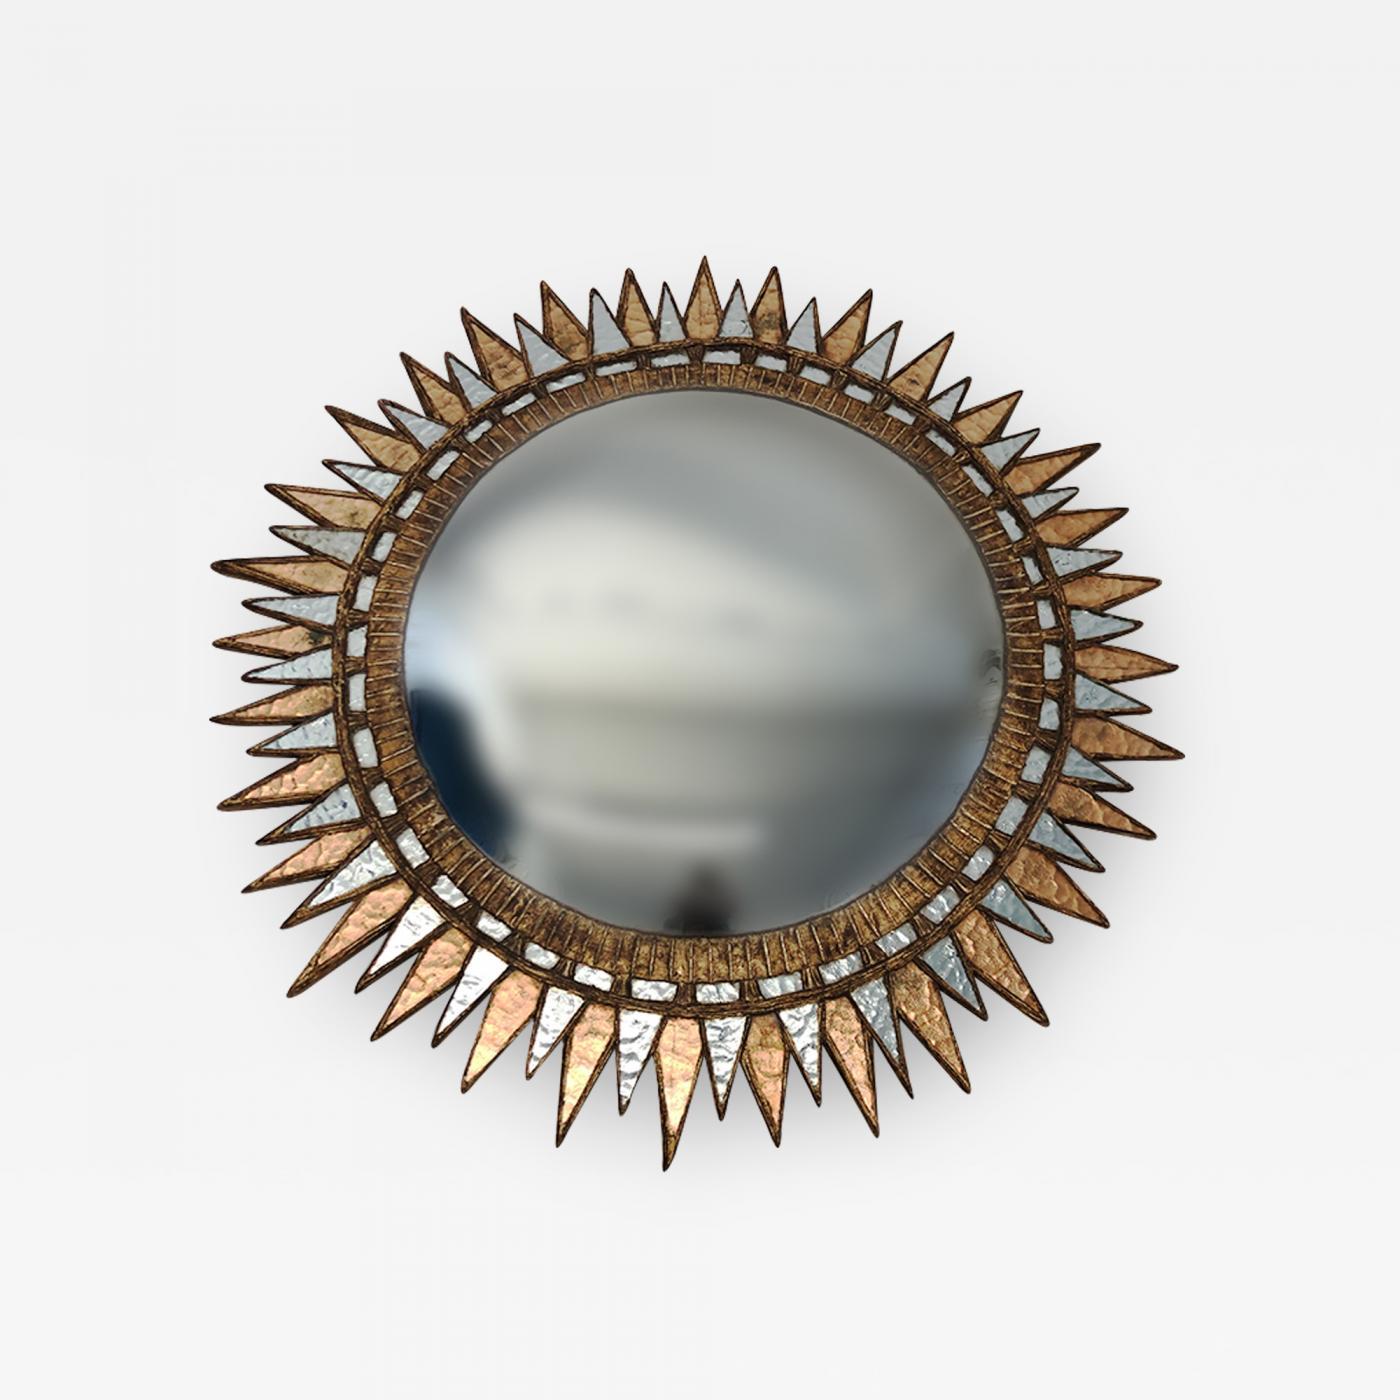 A Starburst form convex mirror in the manner of Line Vautrin